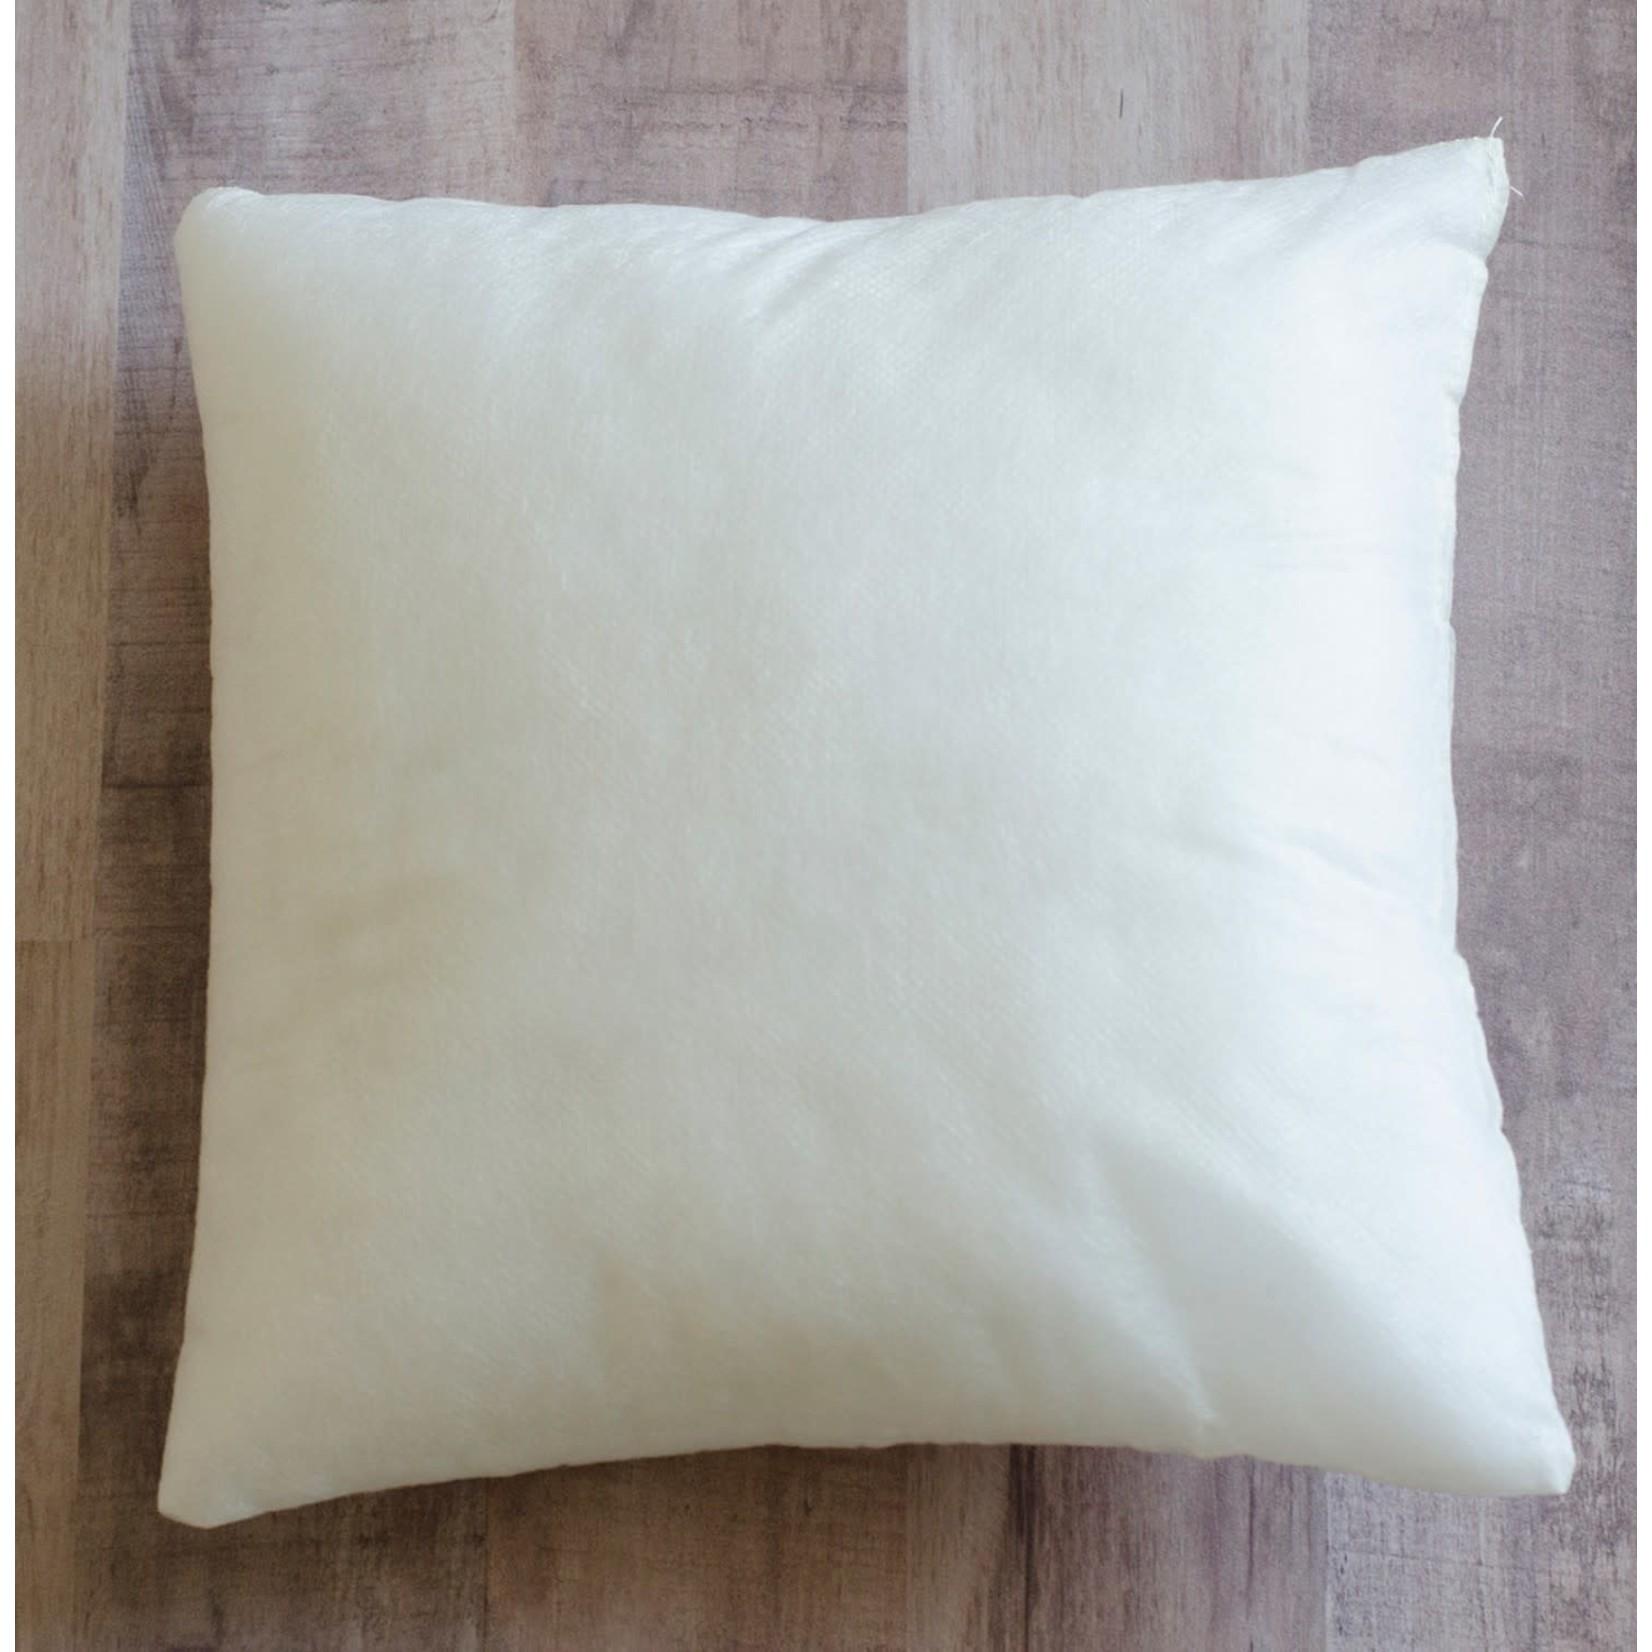 KIMBERBELL DESIGNS 8x8 Pillow Form